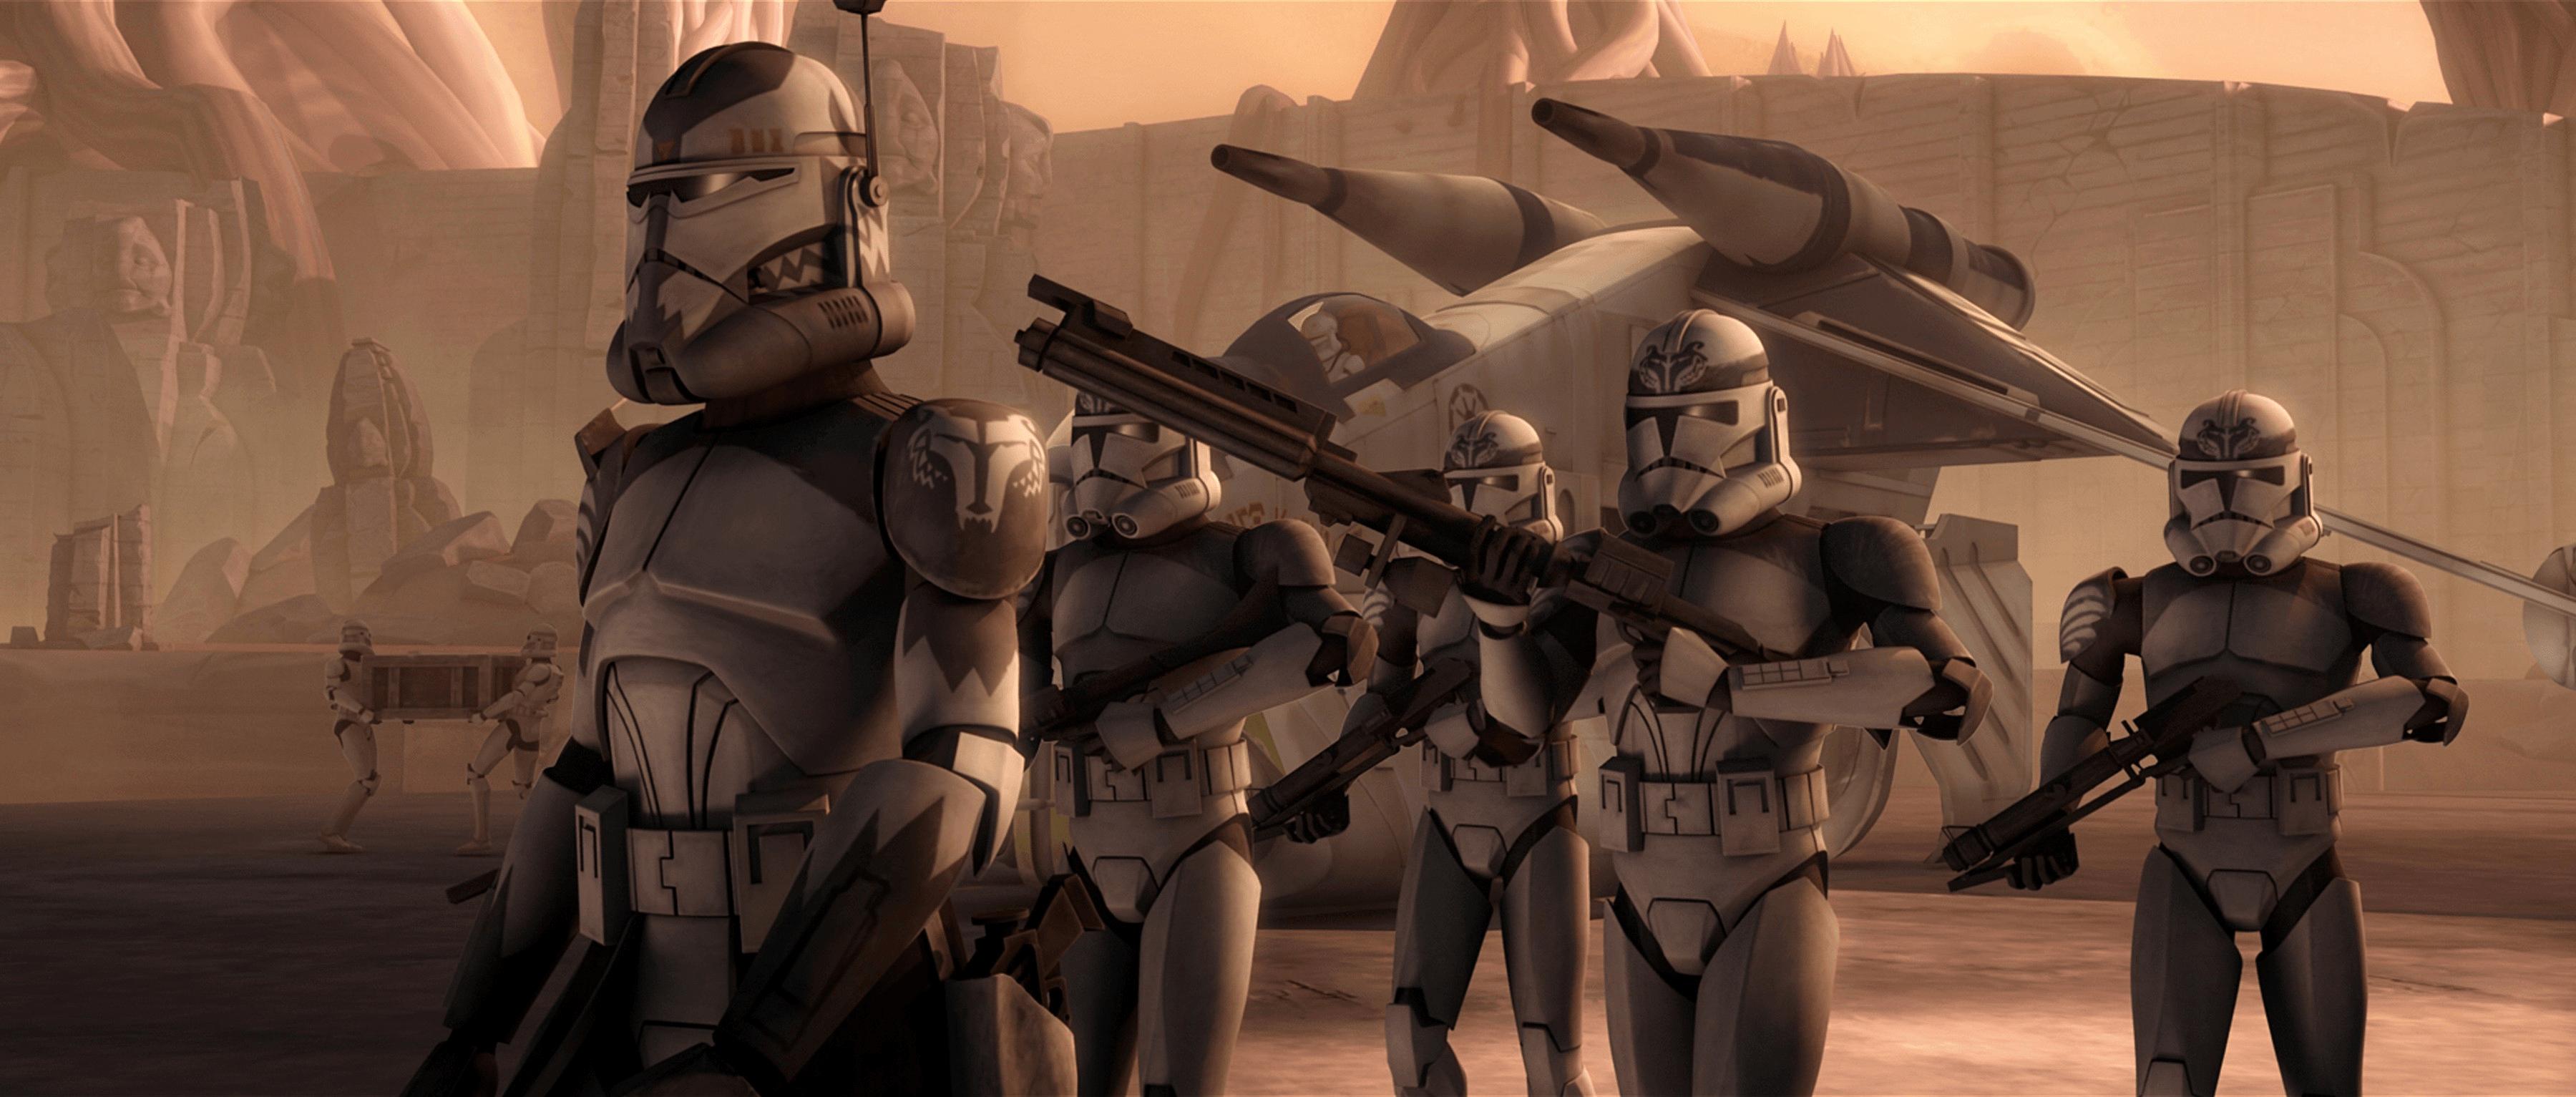 Star Wars Clones Wallpapers Wallpaper Cave